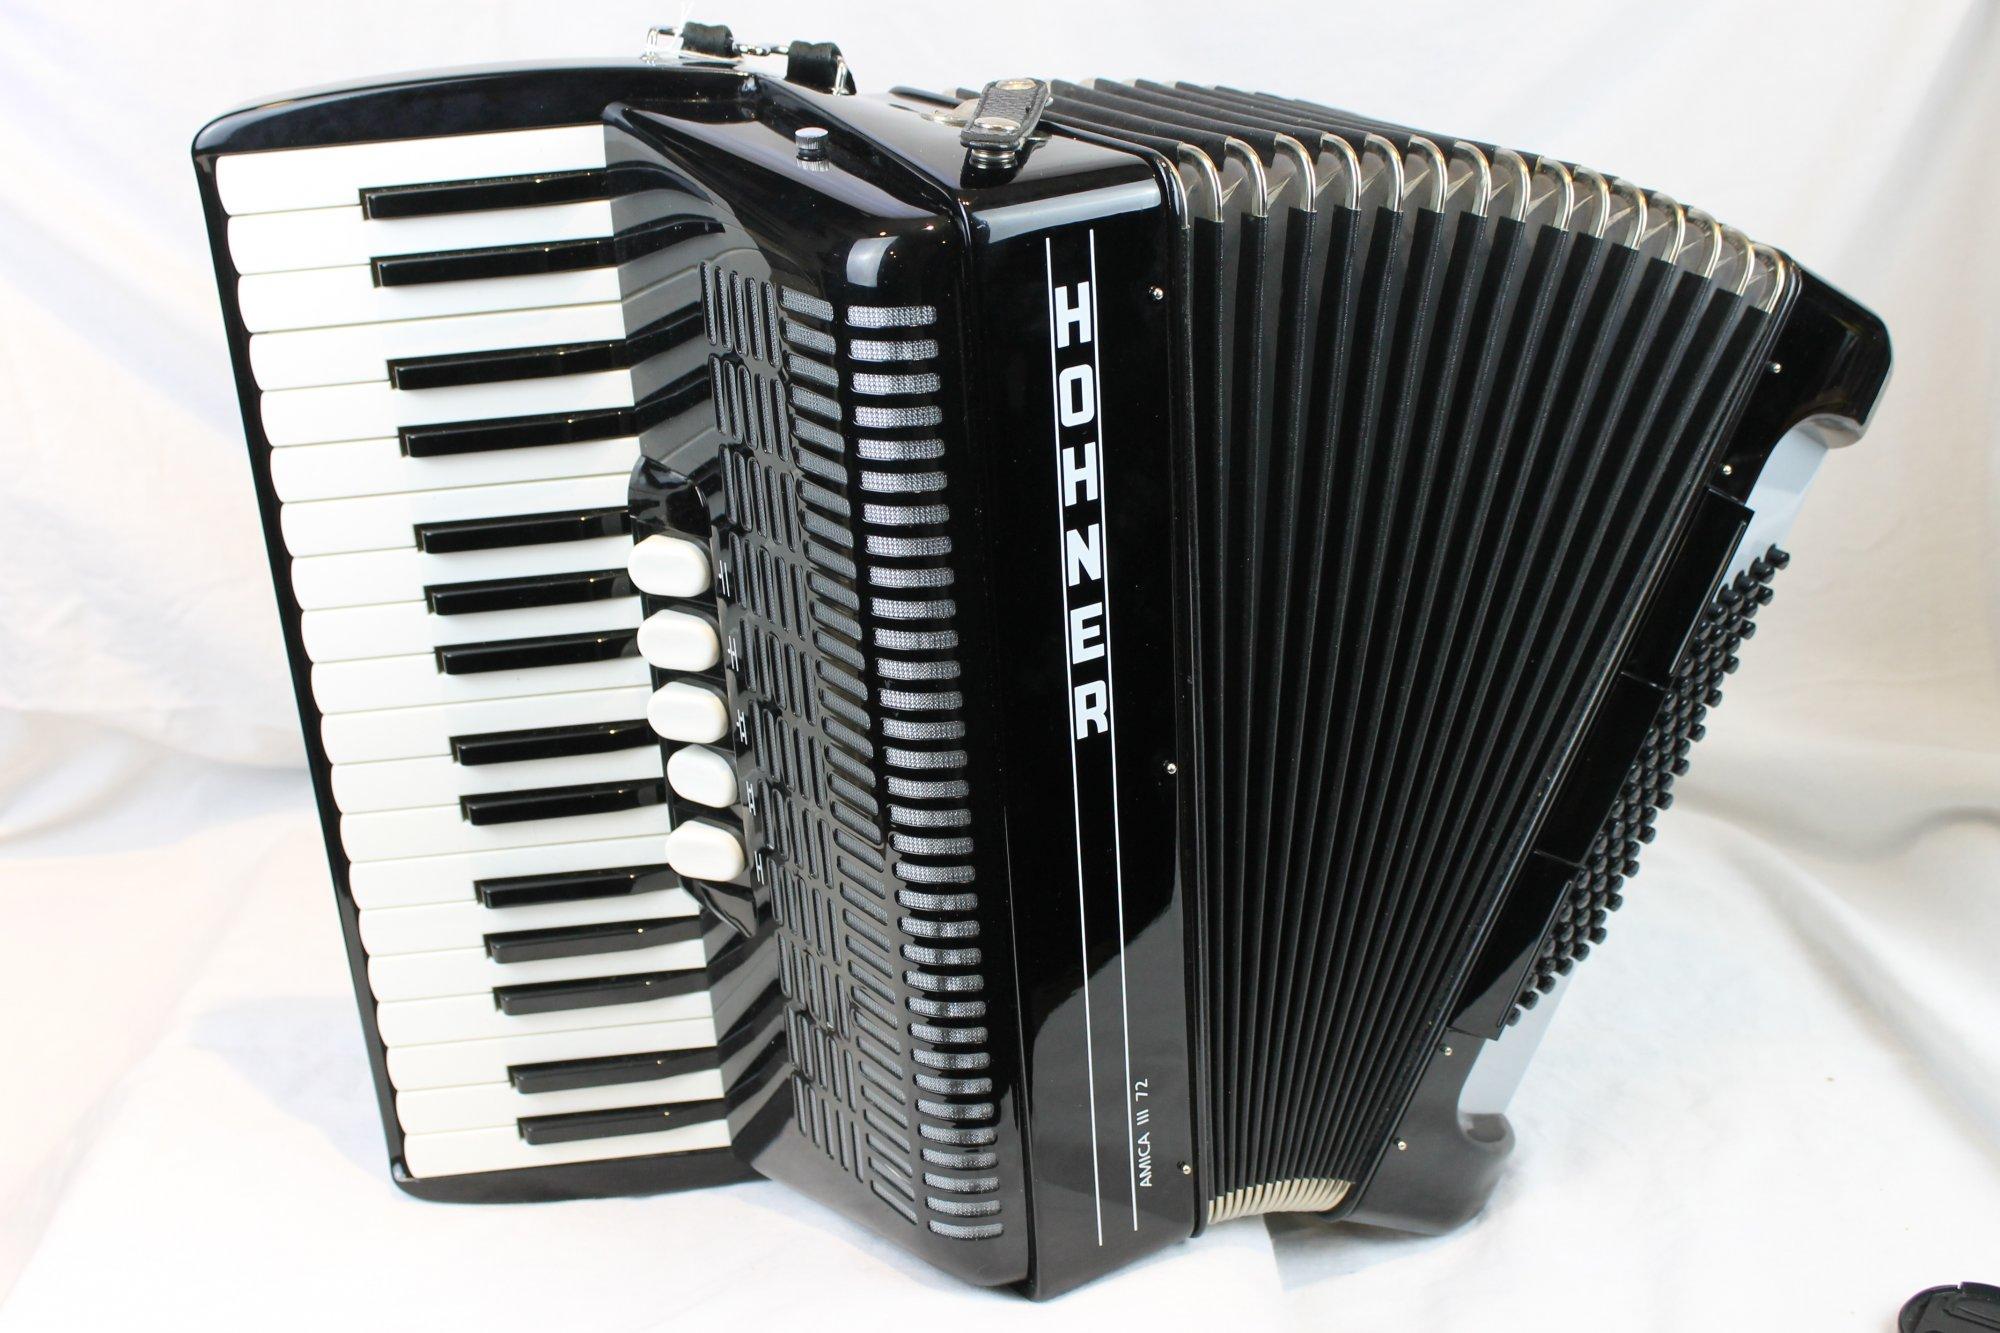 3533 - Black Hohner Amica III Piano Accordion LMM 34 72